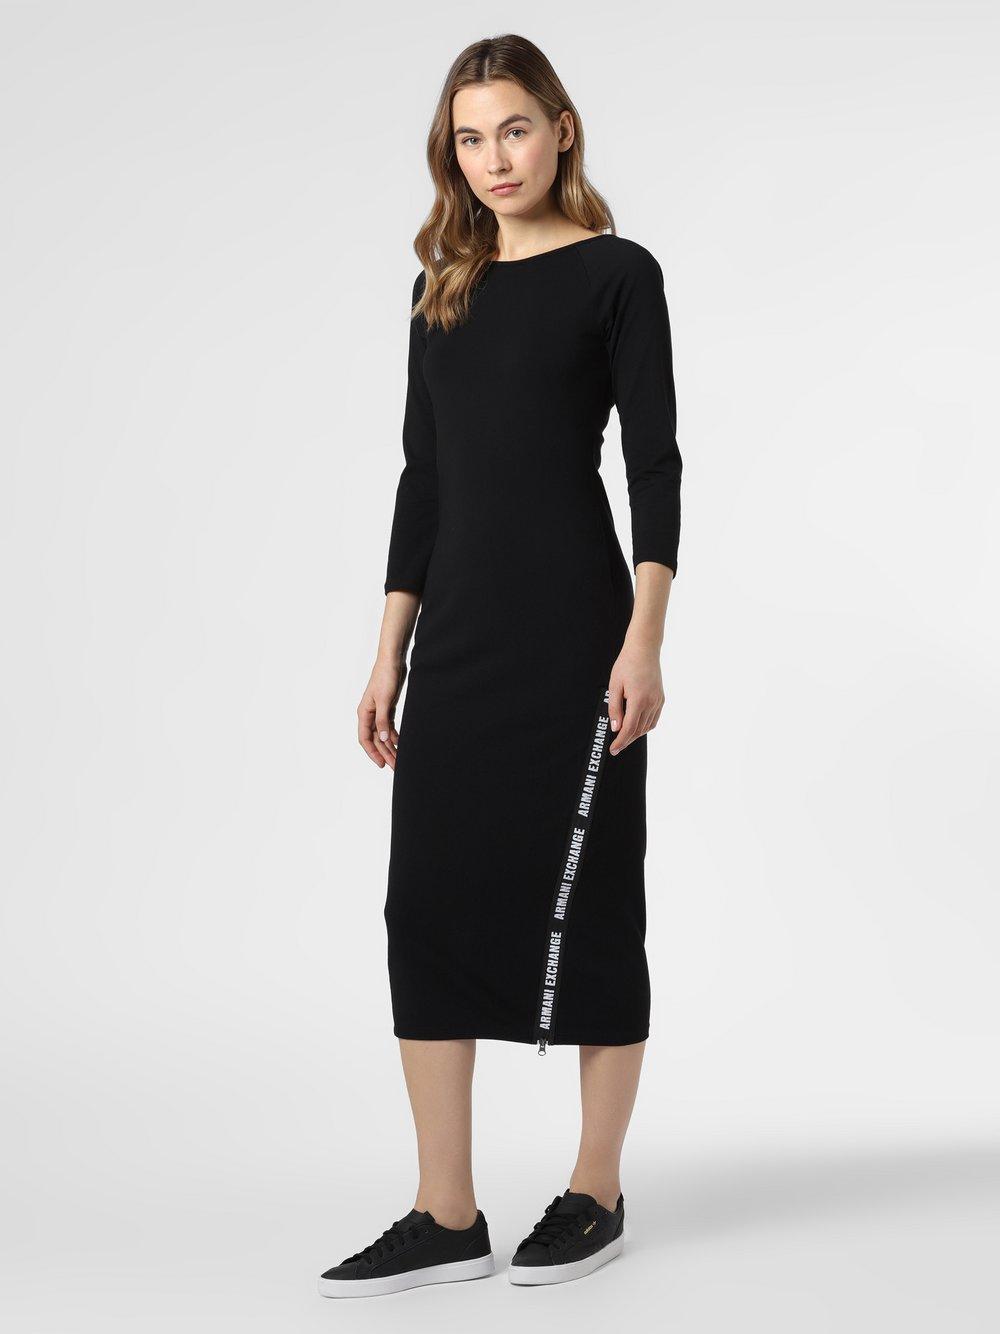 Armani Exchange - Sukienka damska, czarny